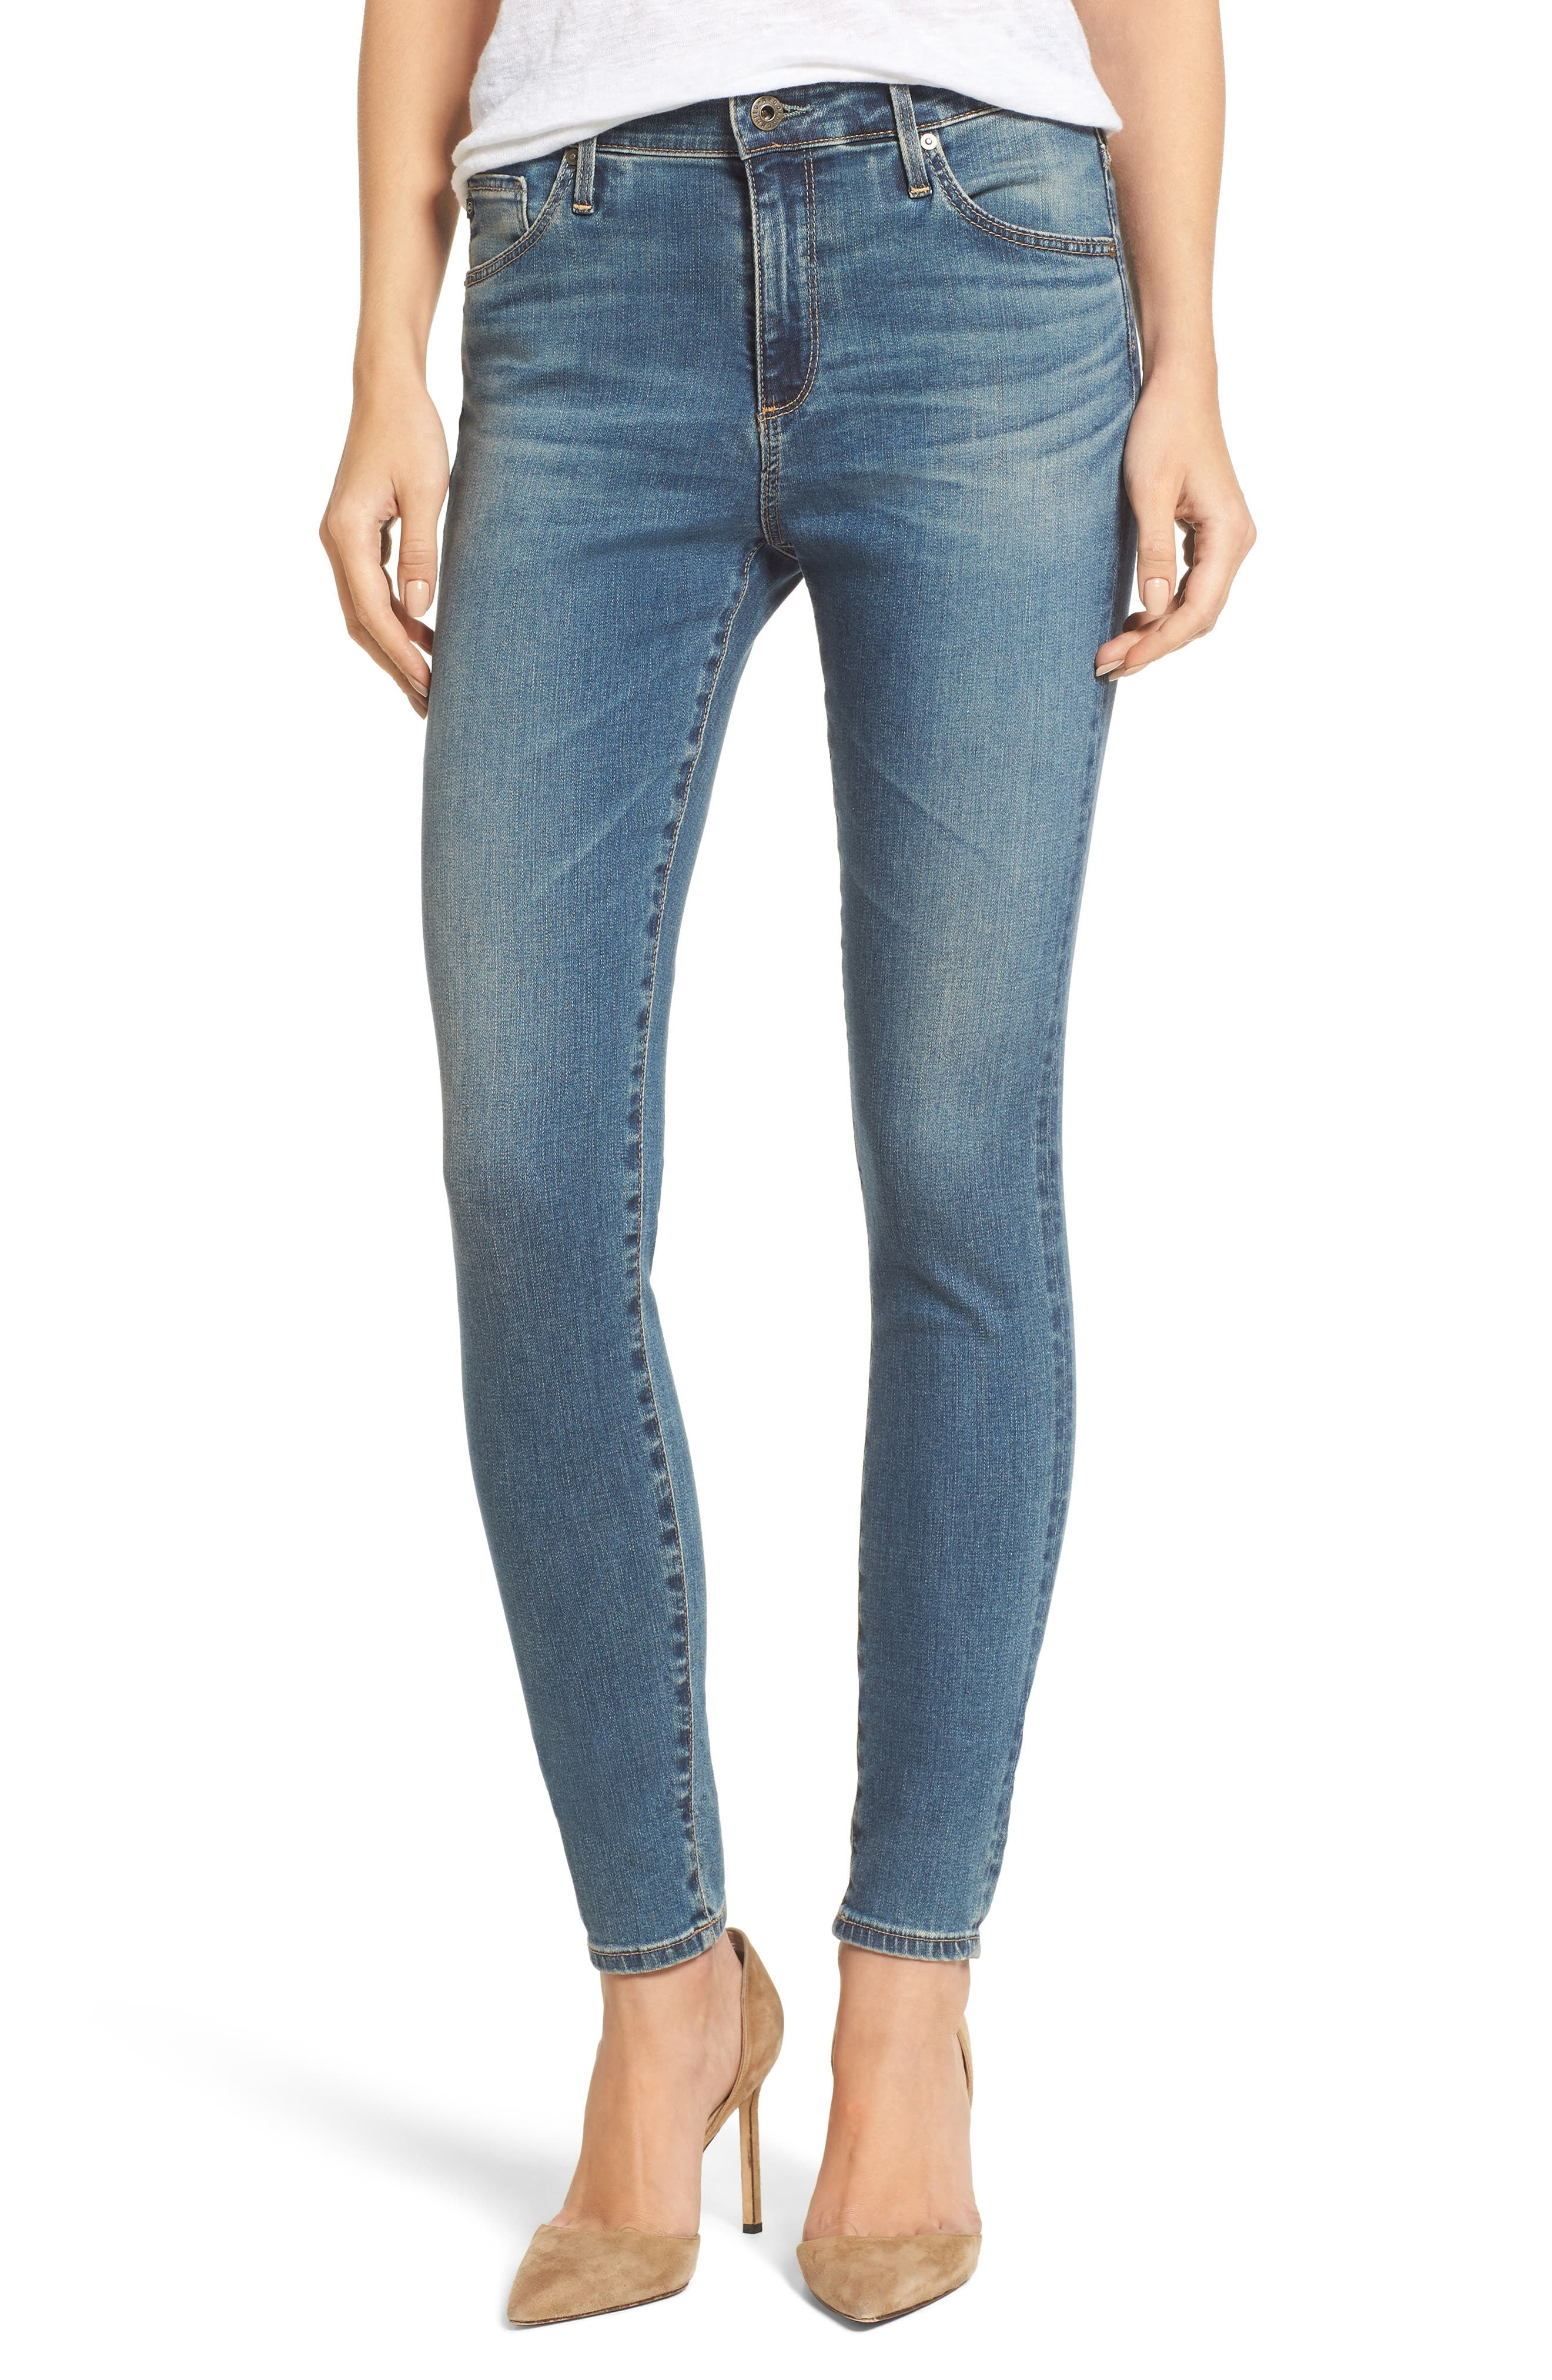 Alternate Image 1 Selected - AG 'The Farrah' High Rise Skinny Jeans